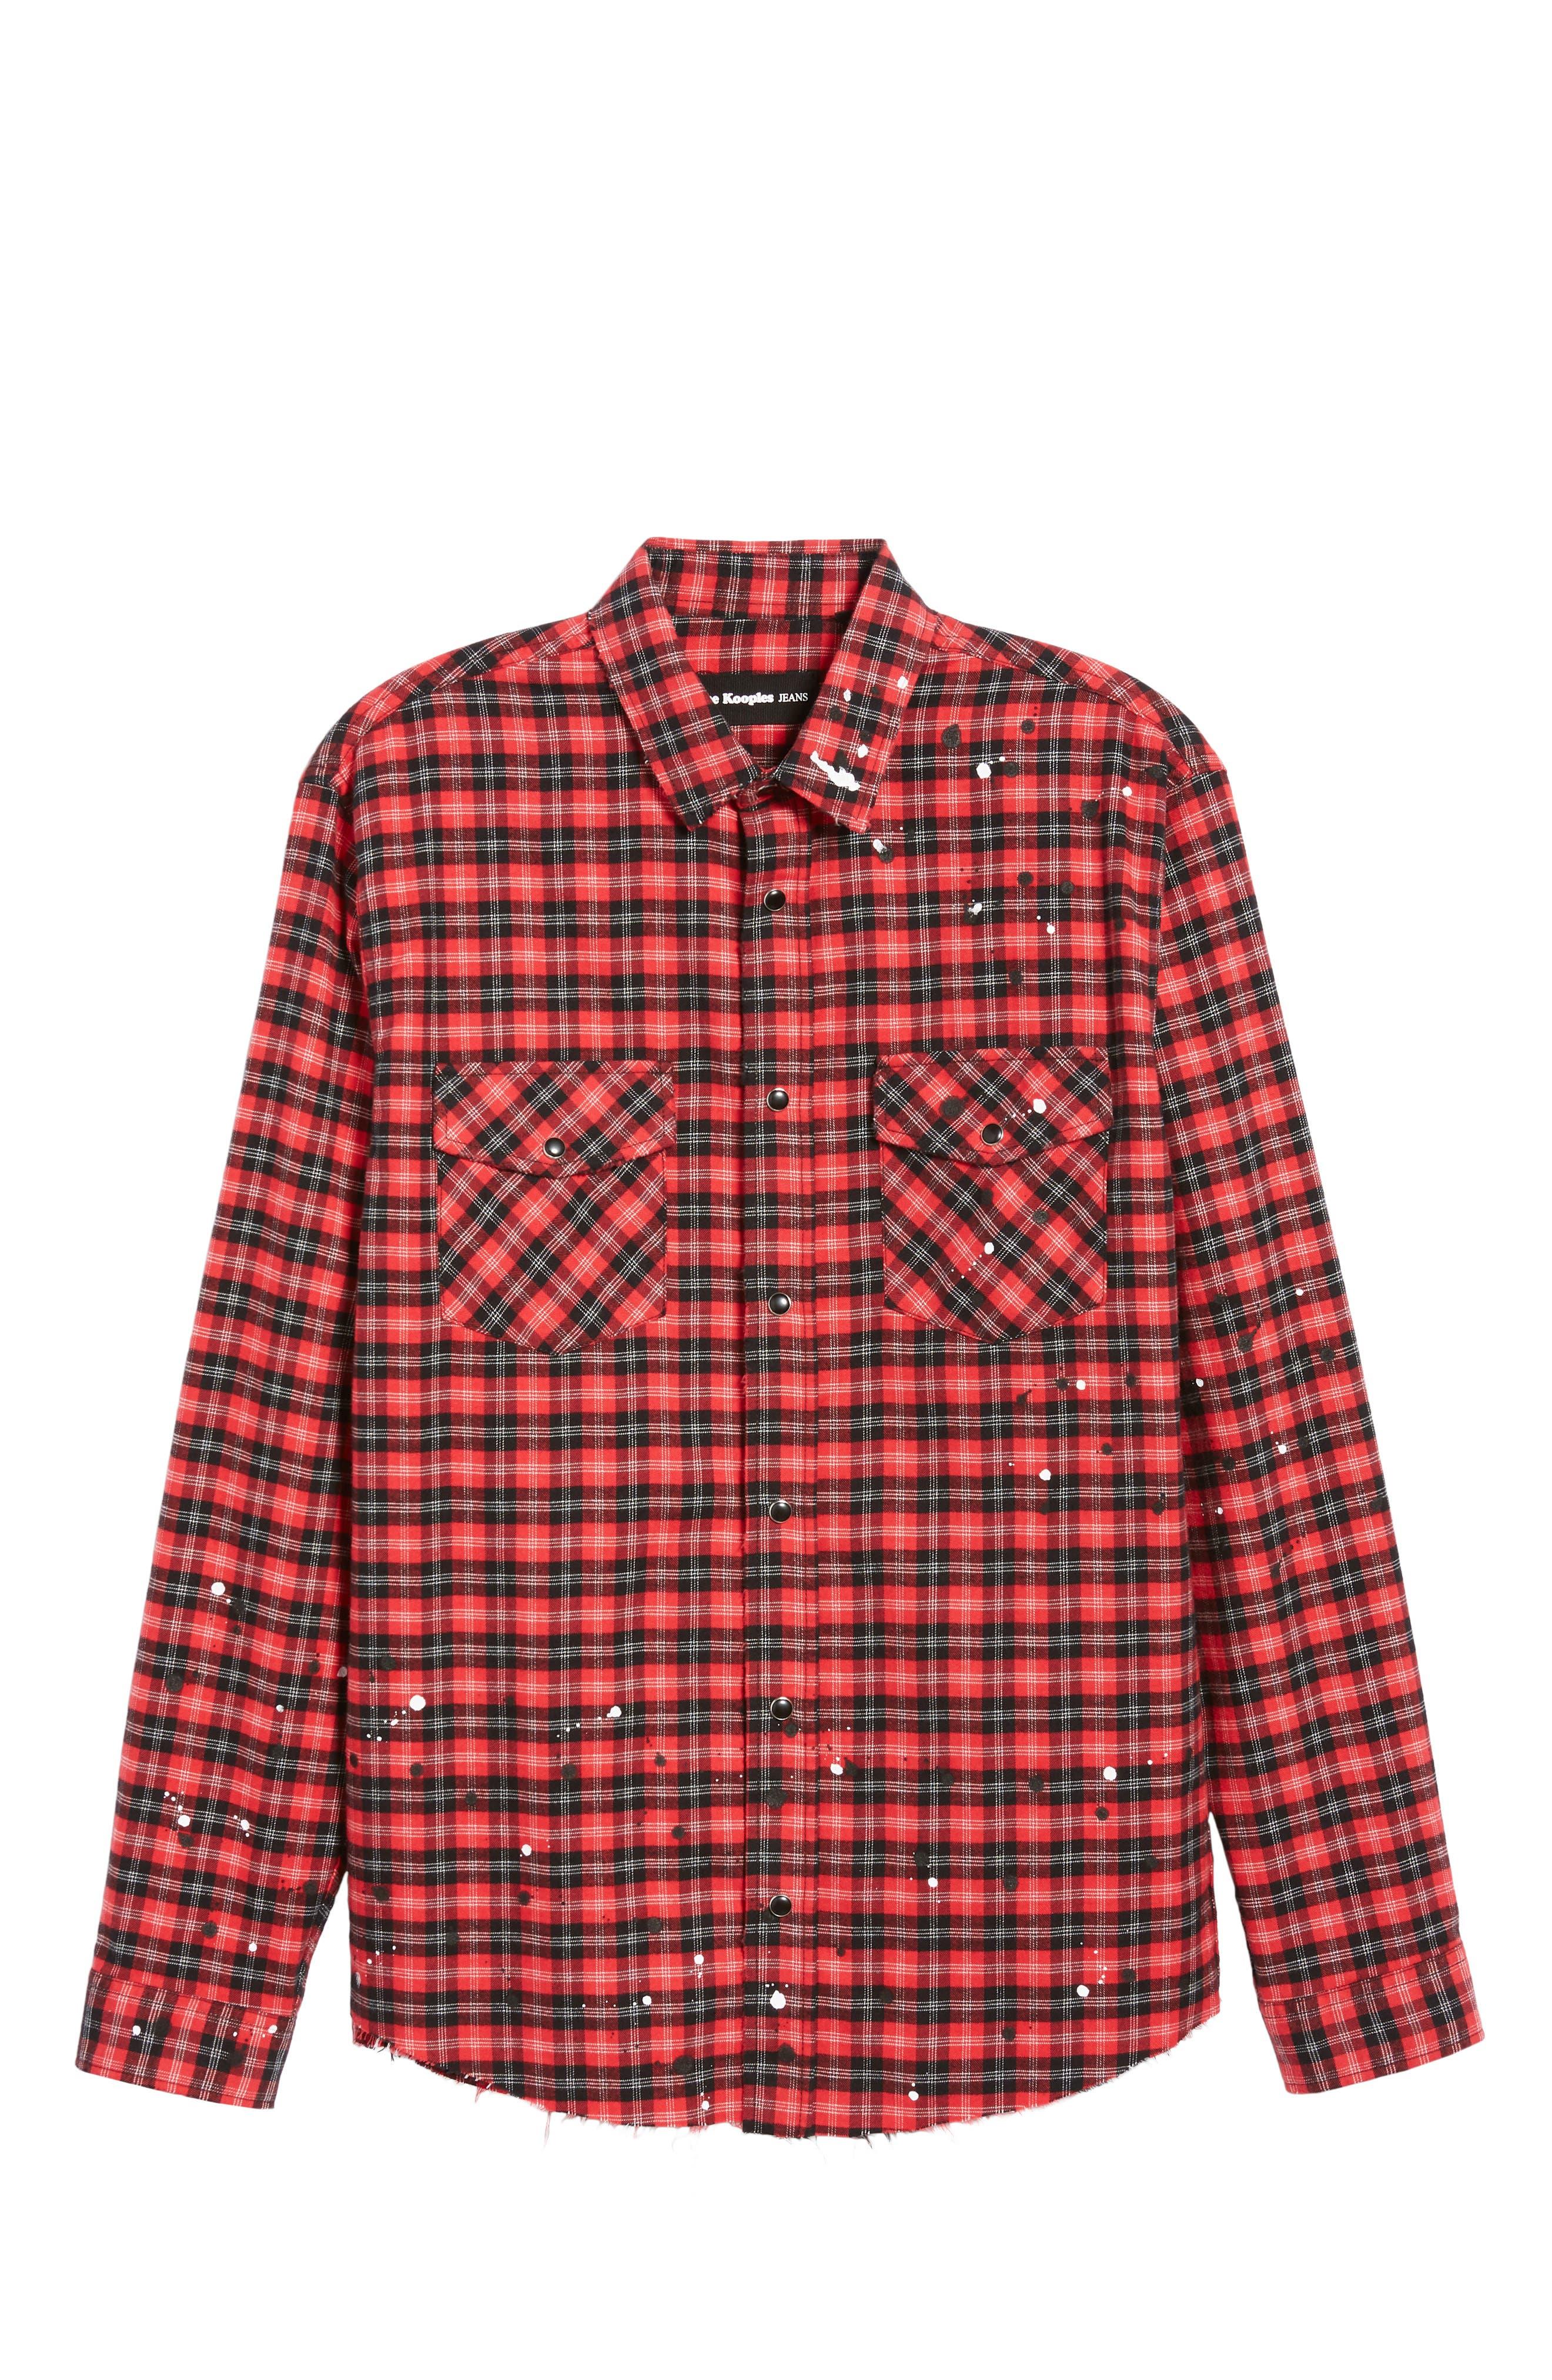 THE KOOPLES, Slim Fit Paint Spatter Flannel Shirt, Alternate thumbnail 5, color, 600